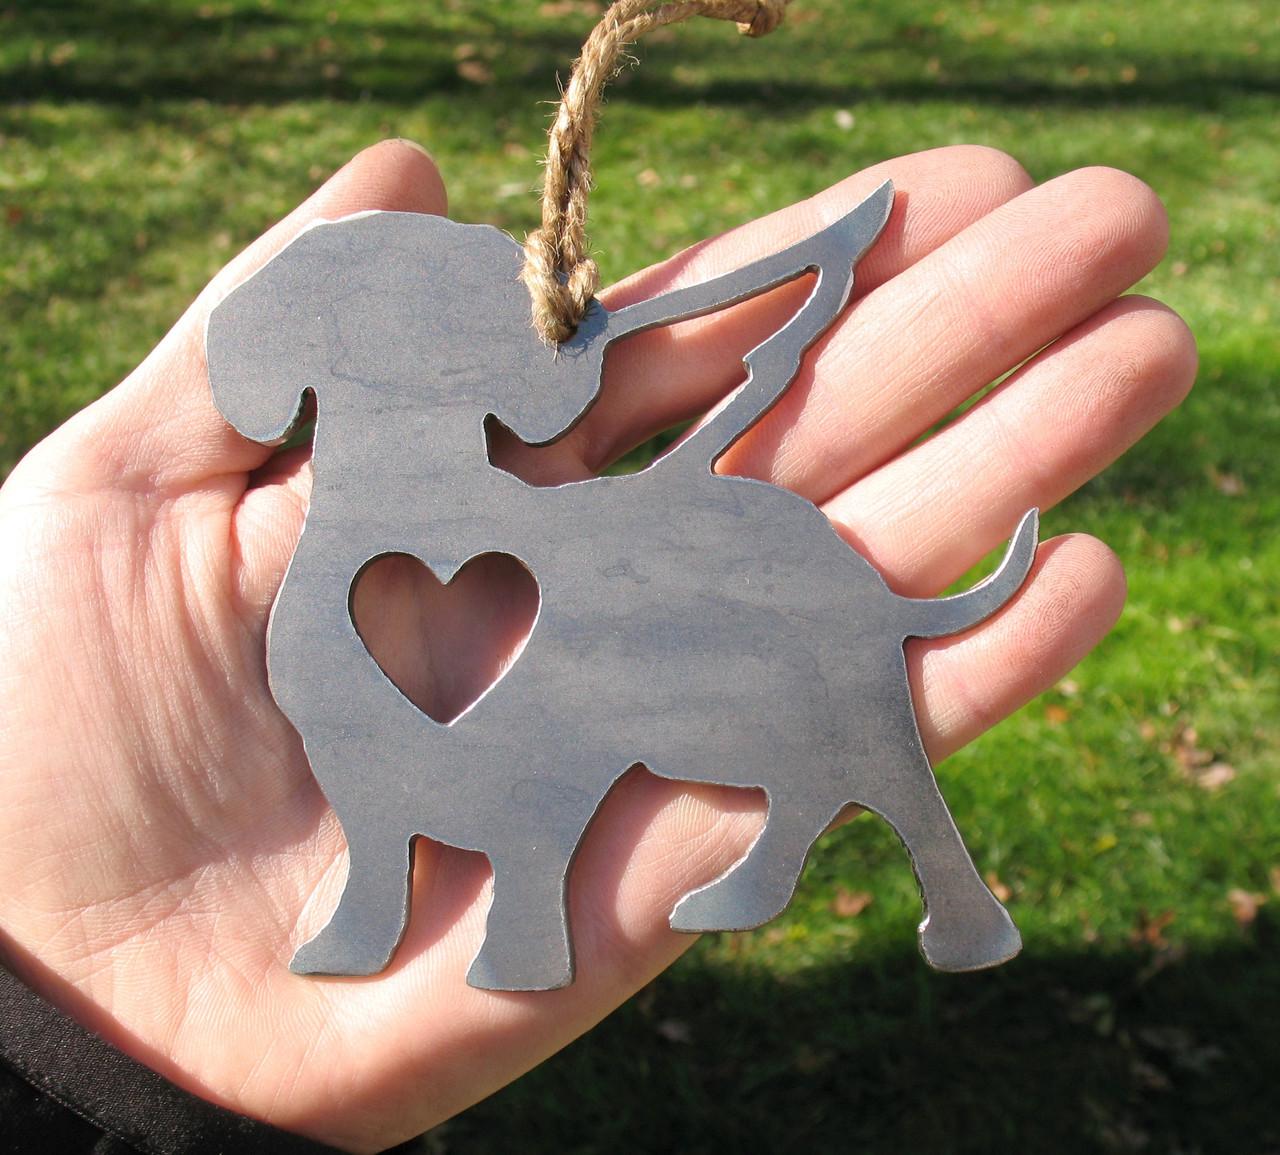 Dachshund 3 Pet Loss Gift Ornament Angel - Pet Memorial - Dog Sympathy Remembrance Gift - Metal Dog Christmas Ornament